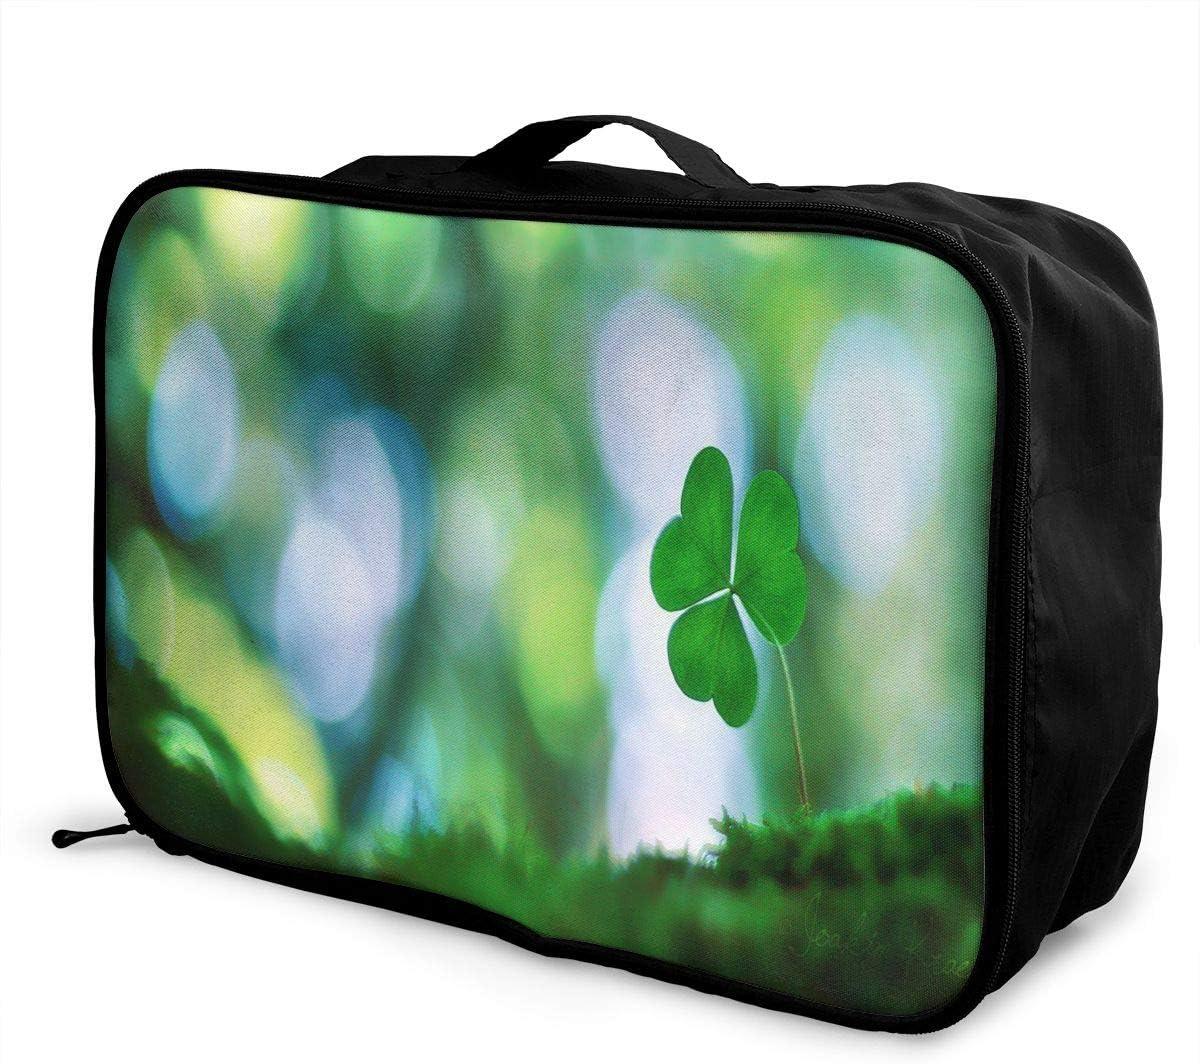 Travel Bags Sunshine Four Leaf Clover Portable Foldable Trolley Handle Luggage Bag